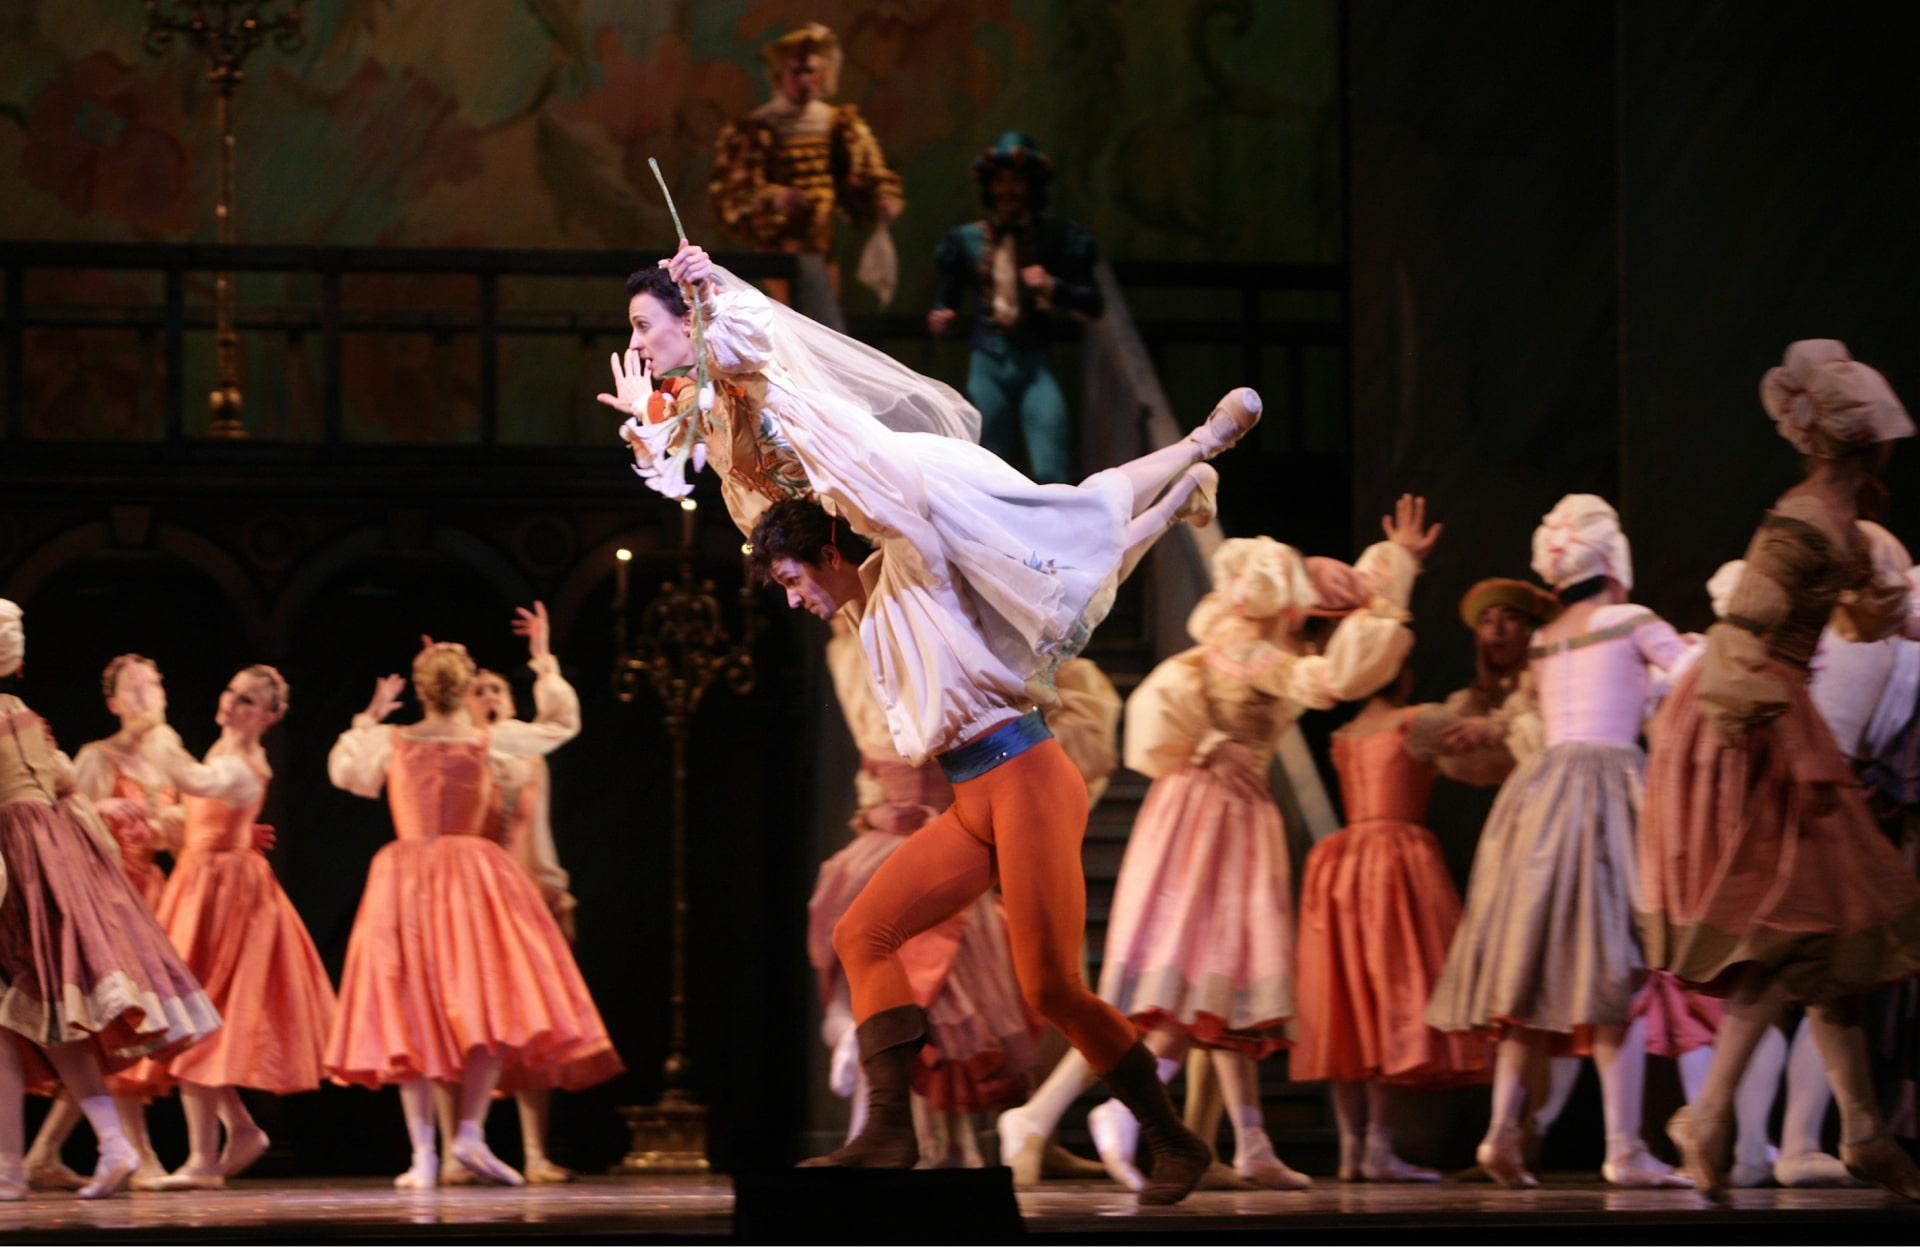 Ballerina in gauzy wedding dress is held aloft by dancer in orange tights amid crowd of blurry guests.